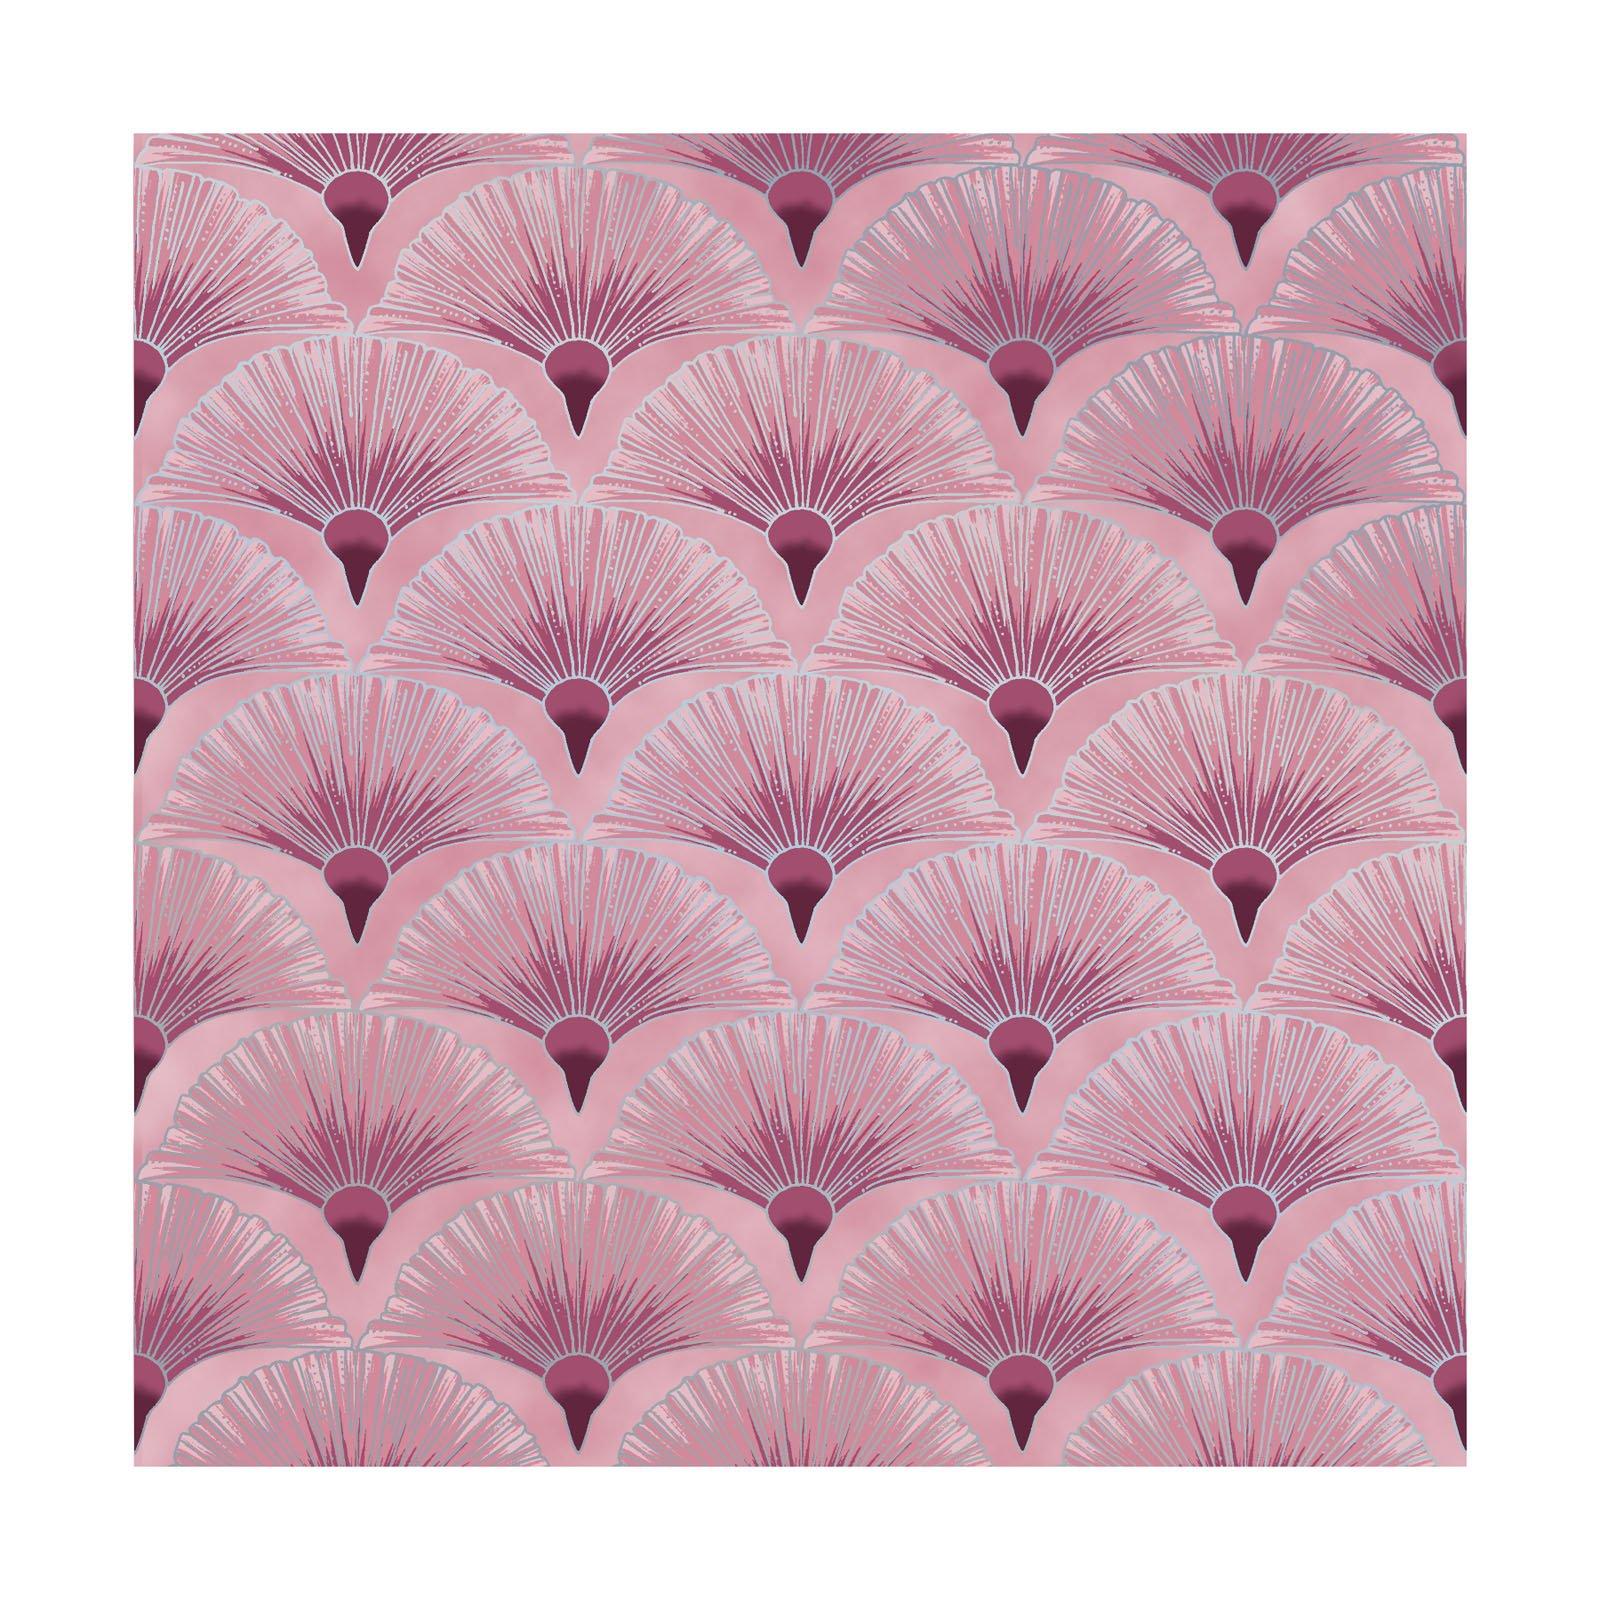 TTP0005M-06 Pink Melba Metallic Nouveau